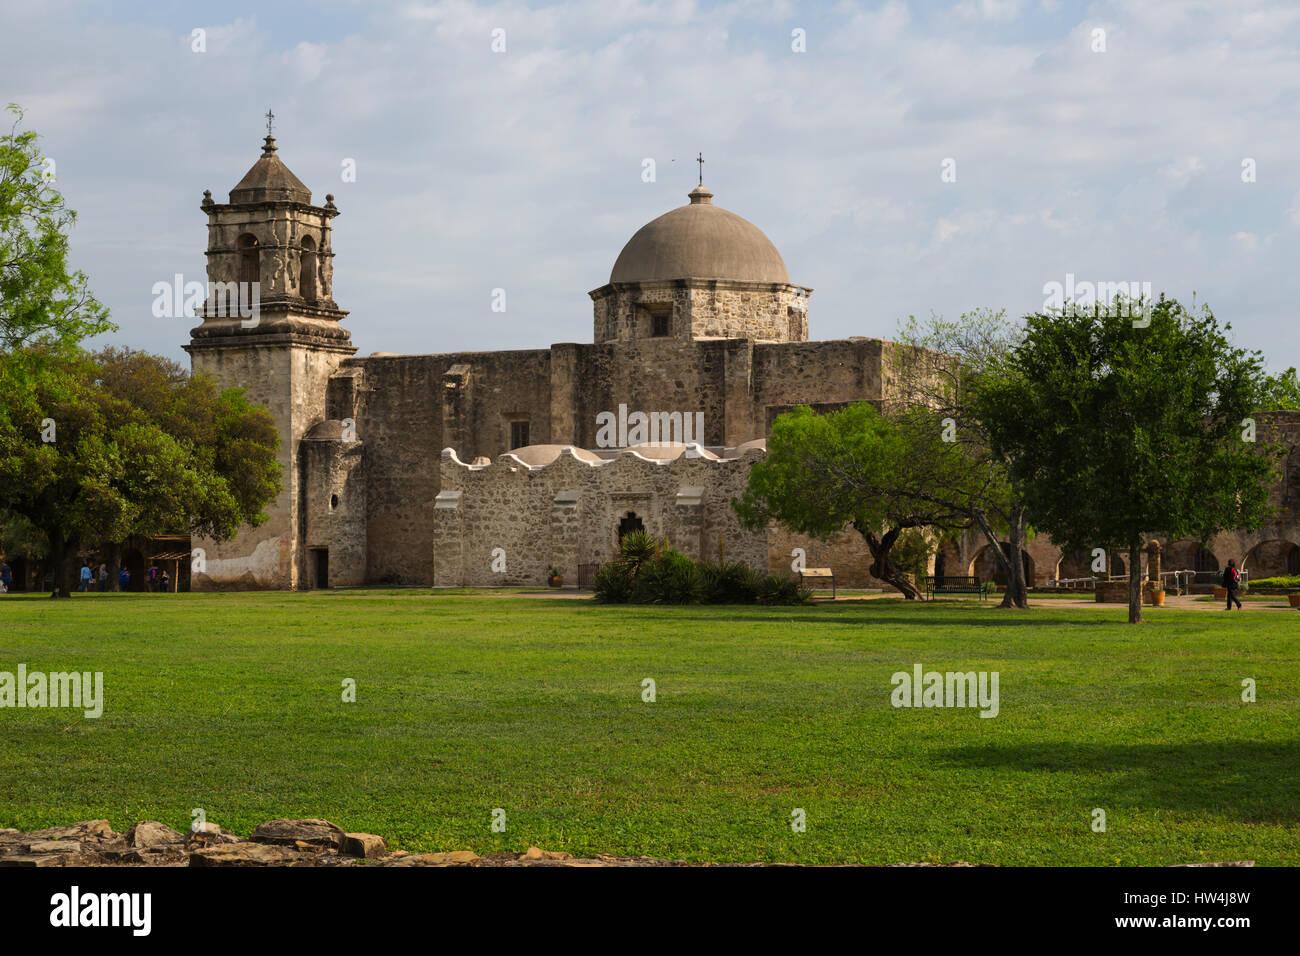 Mission San Jose, San Antonio Missions, TX, USA - Stock Image